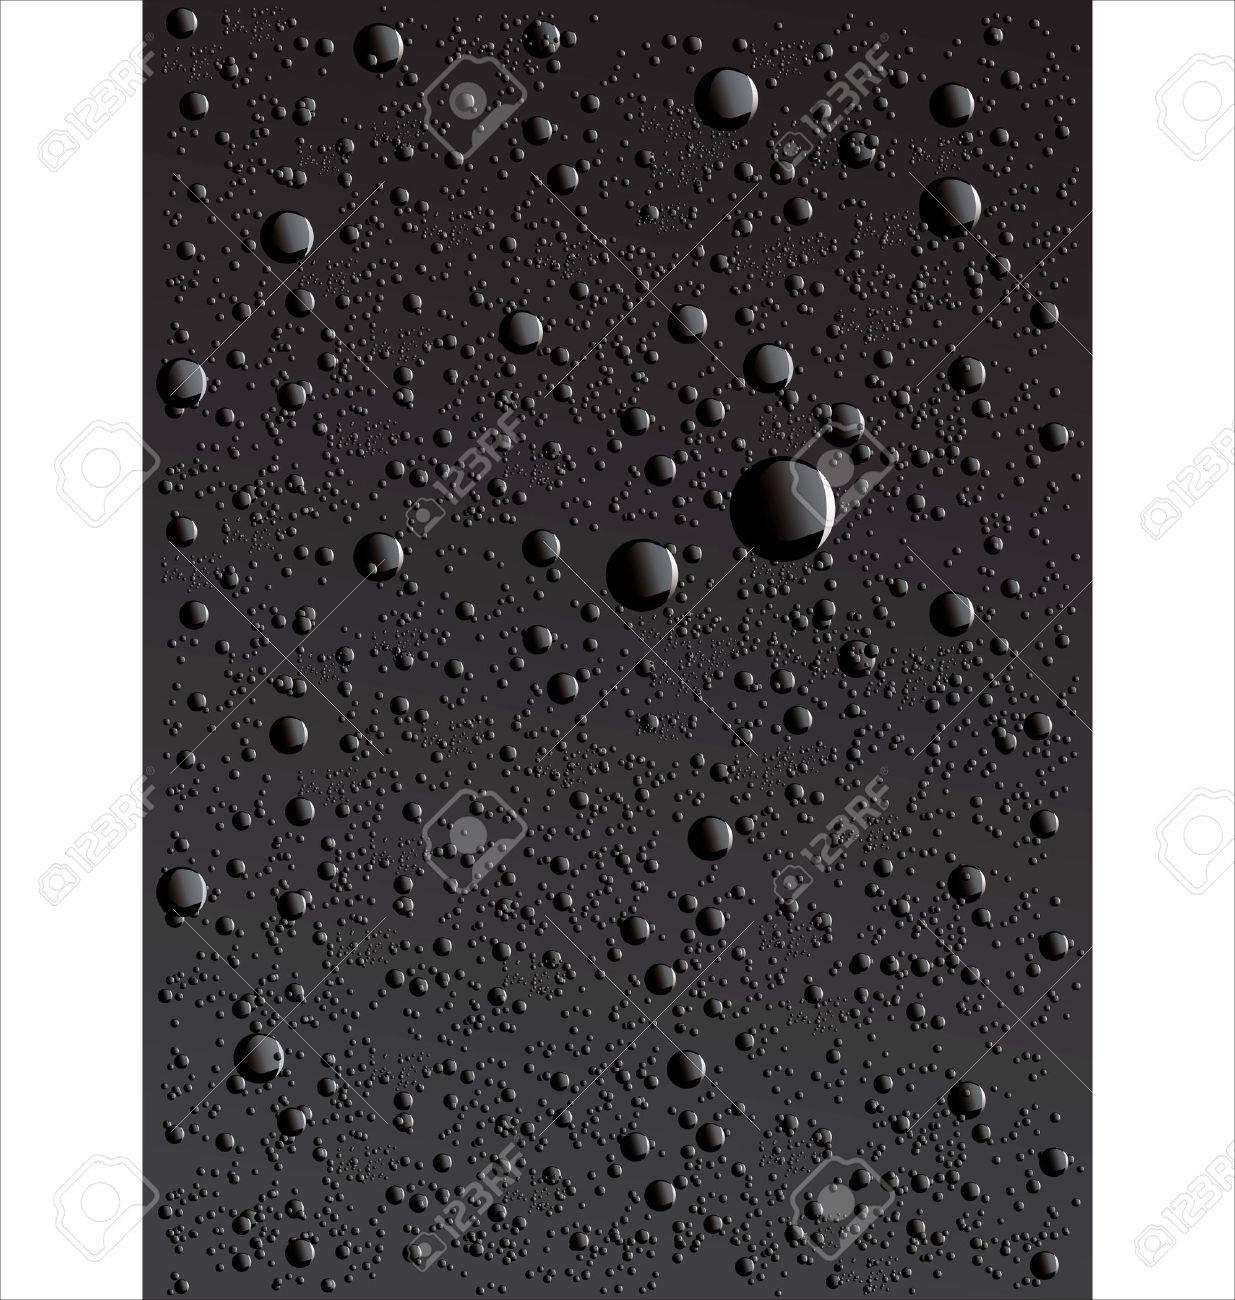 Water drop background - 10255493